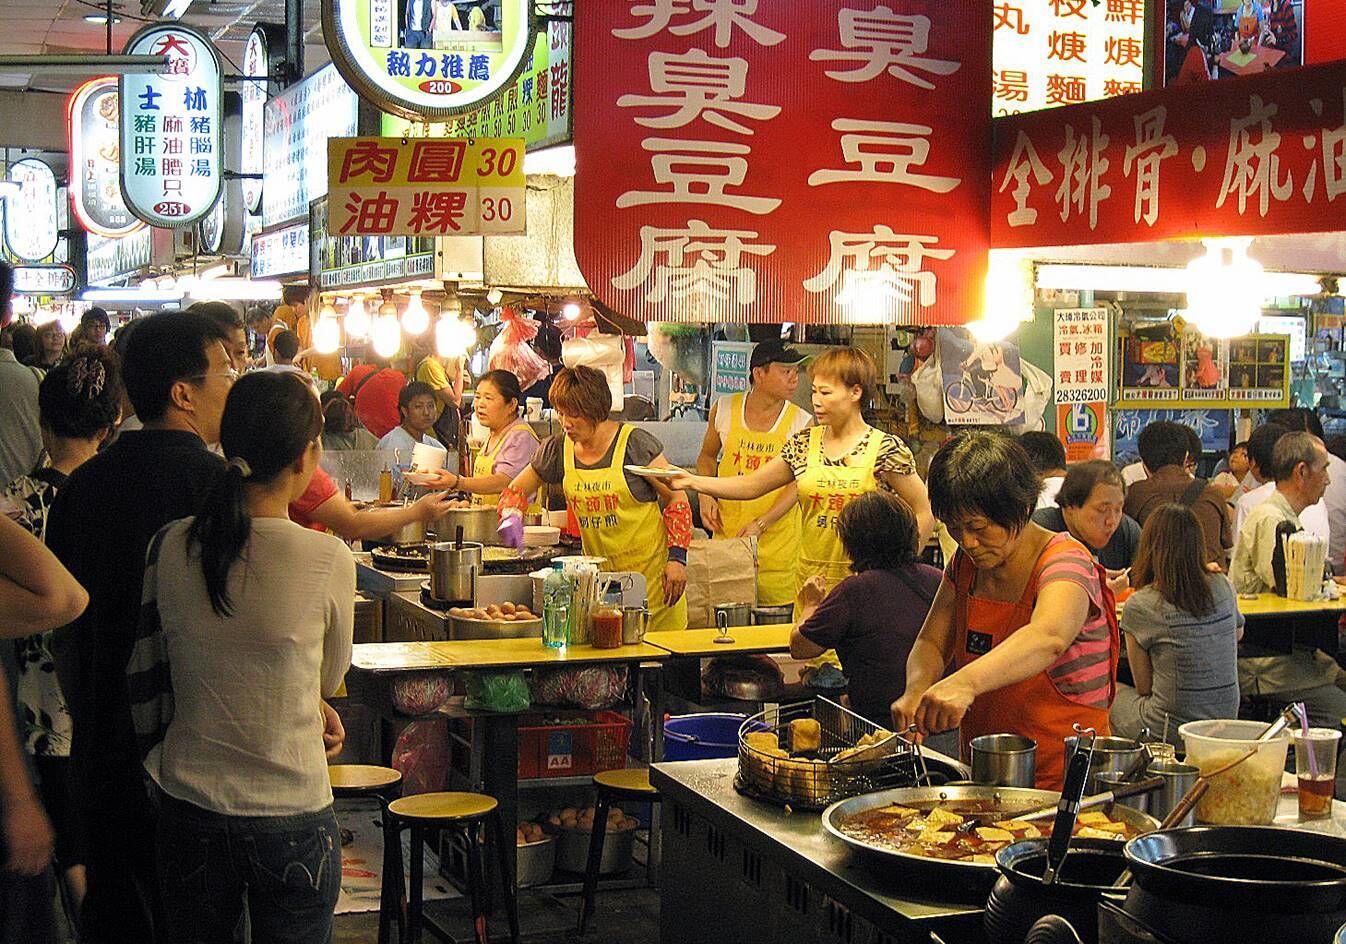 Tobat, Mantan Bos Gangster Tersohor Taiwan Ini Kini Jualan Mie Ayam